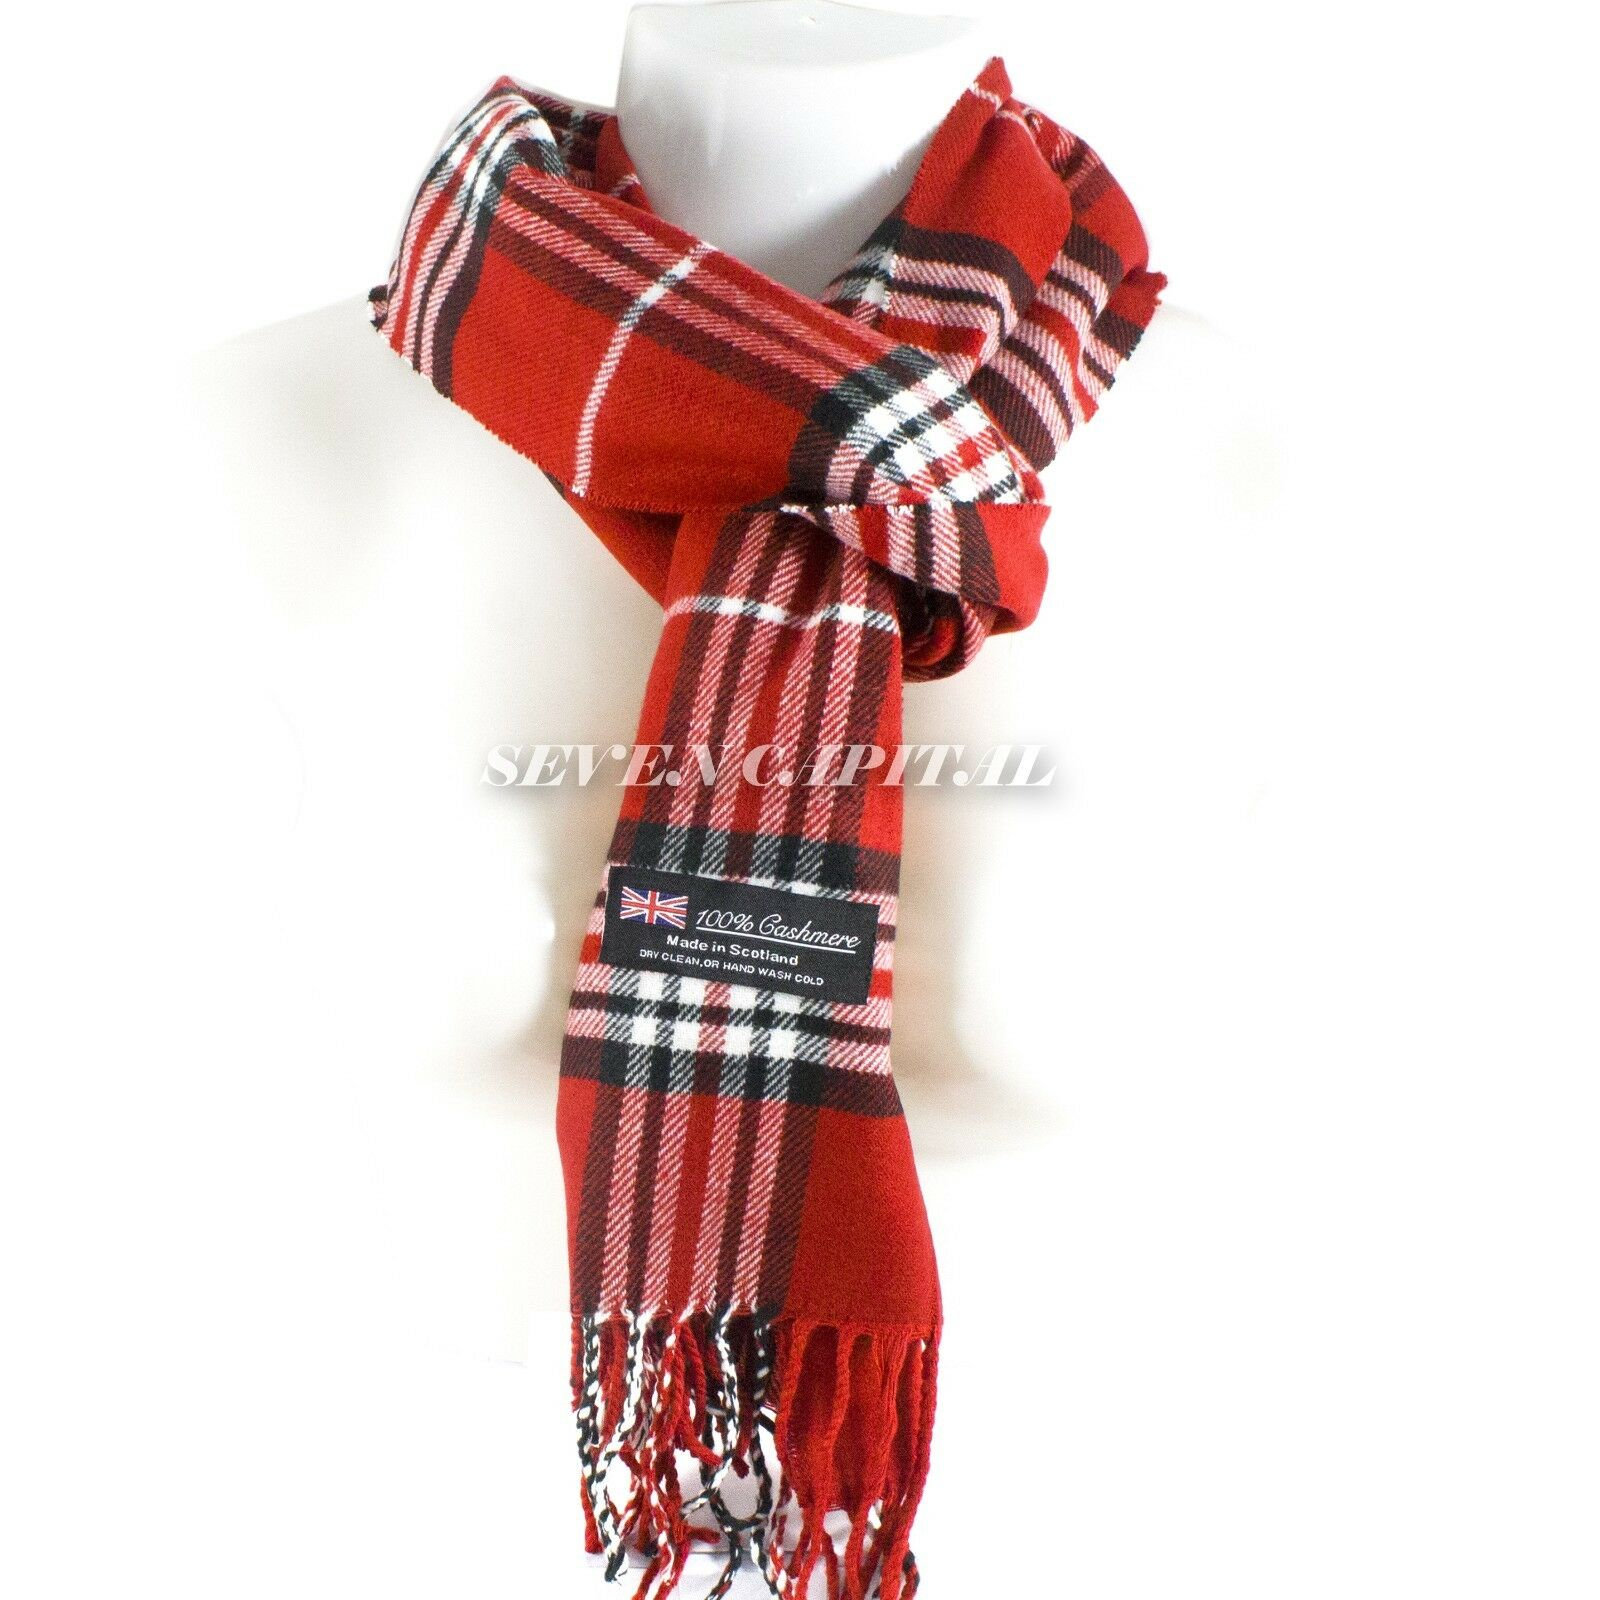 Mens Womens Winter Warm SCOTLAND Made 100% CASHMERE Scarf Scarves Plaid Wool 7. Plaid: Red/White/Black